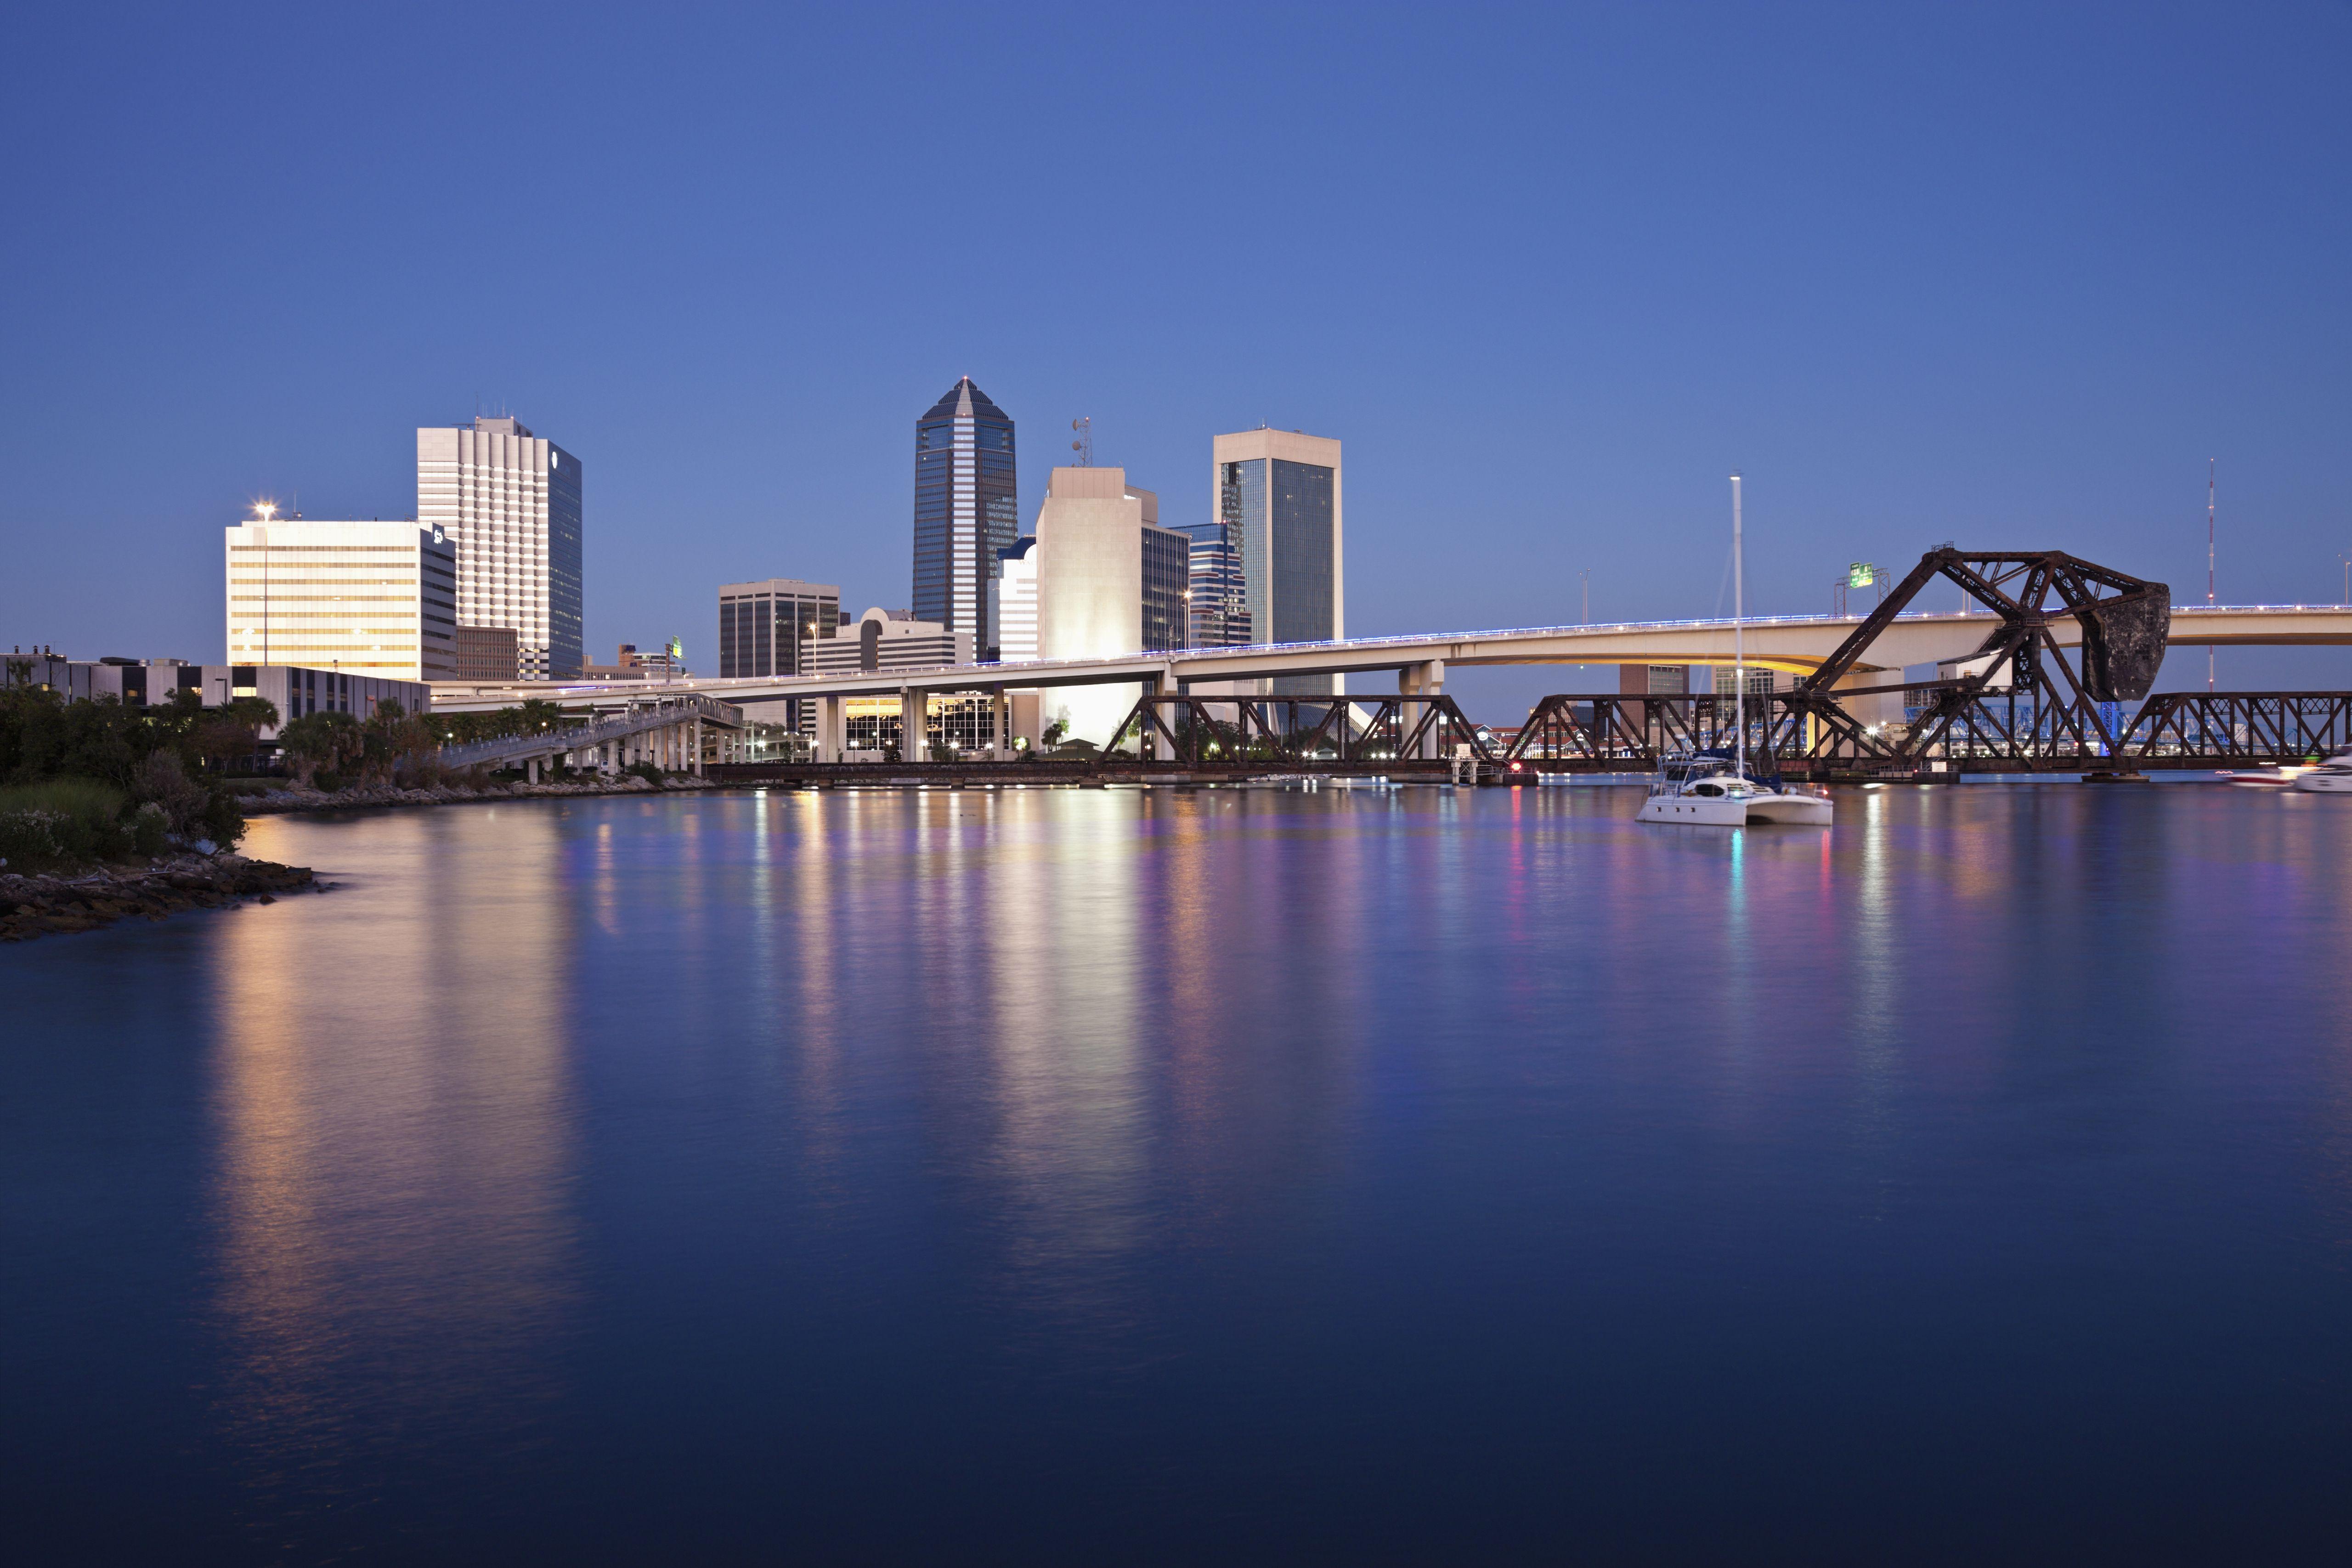 USA, Florida, Jacksonville, City skyline at dusk